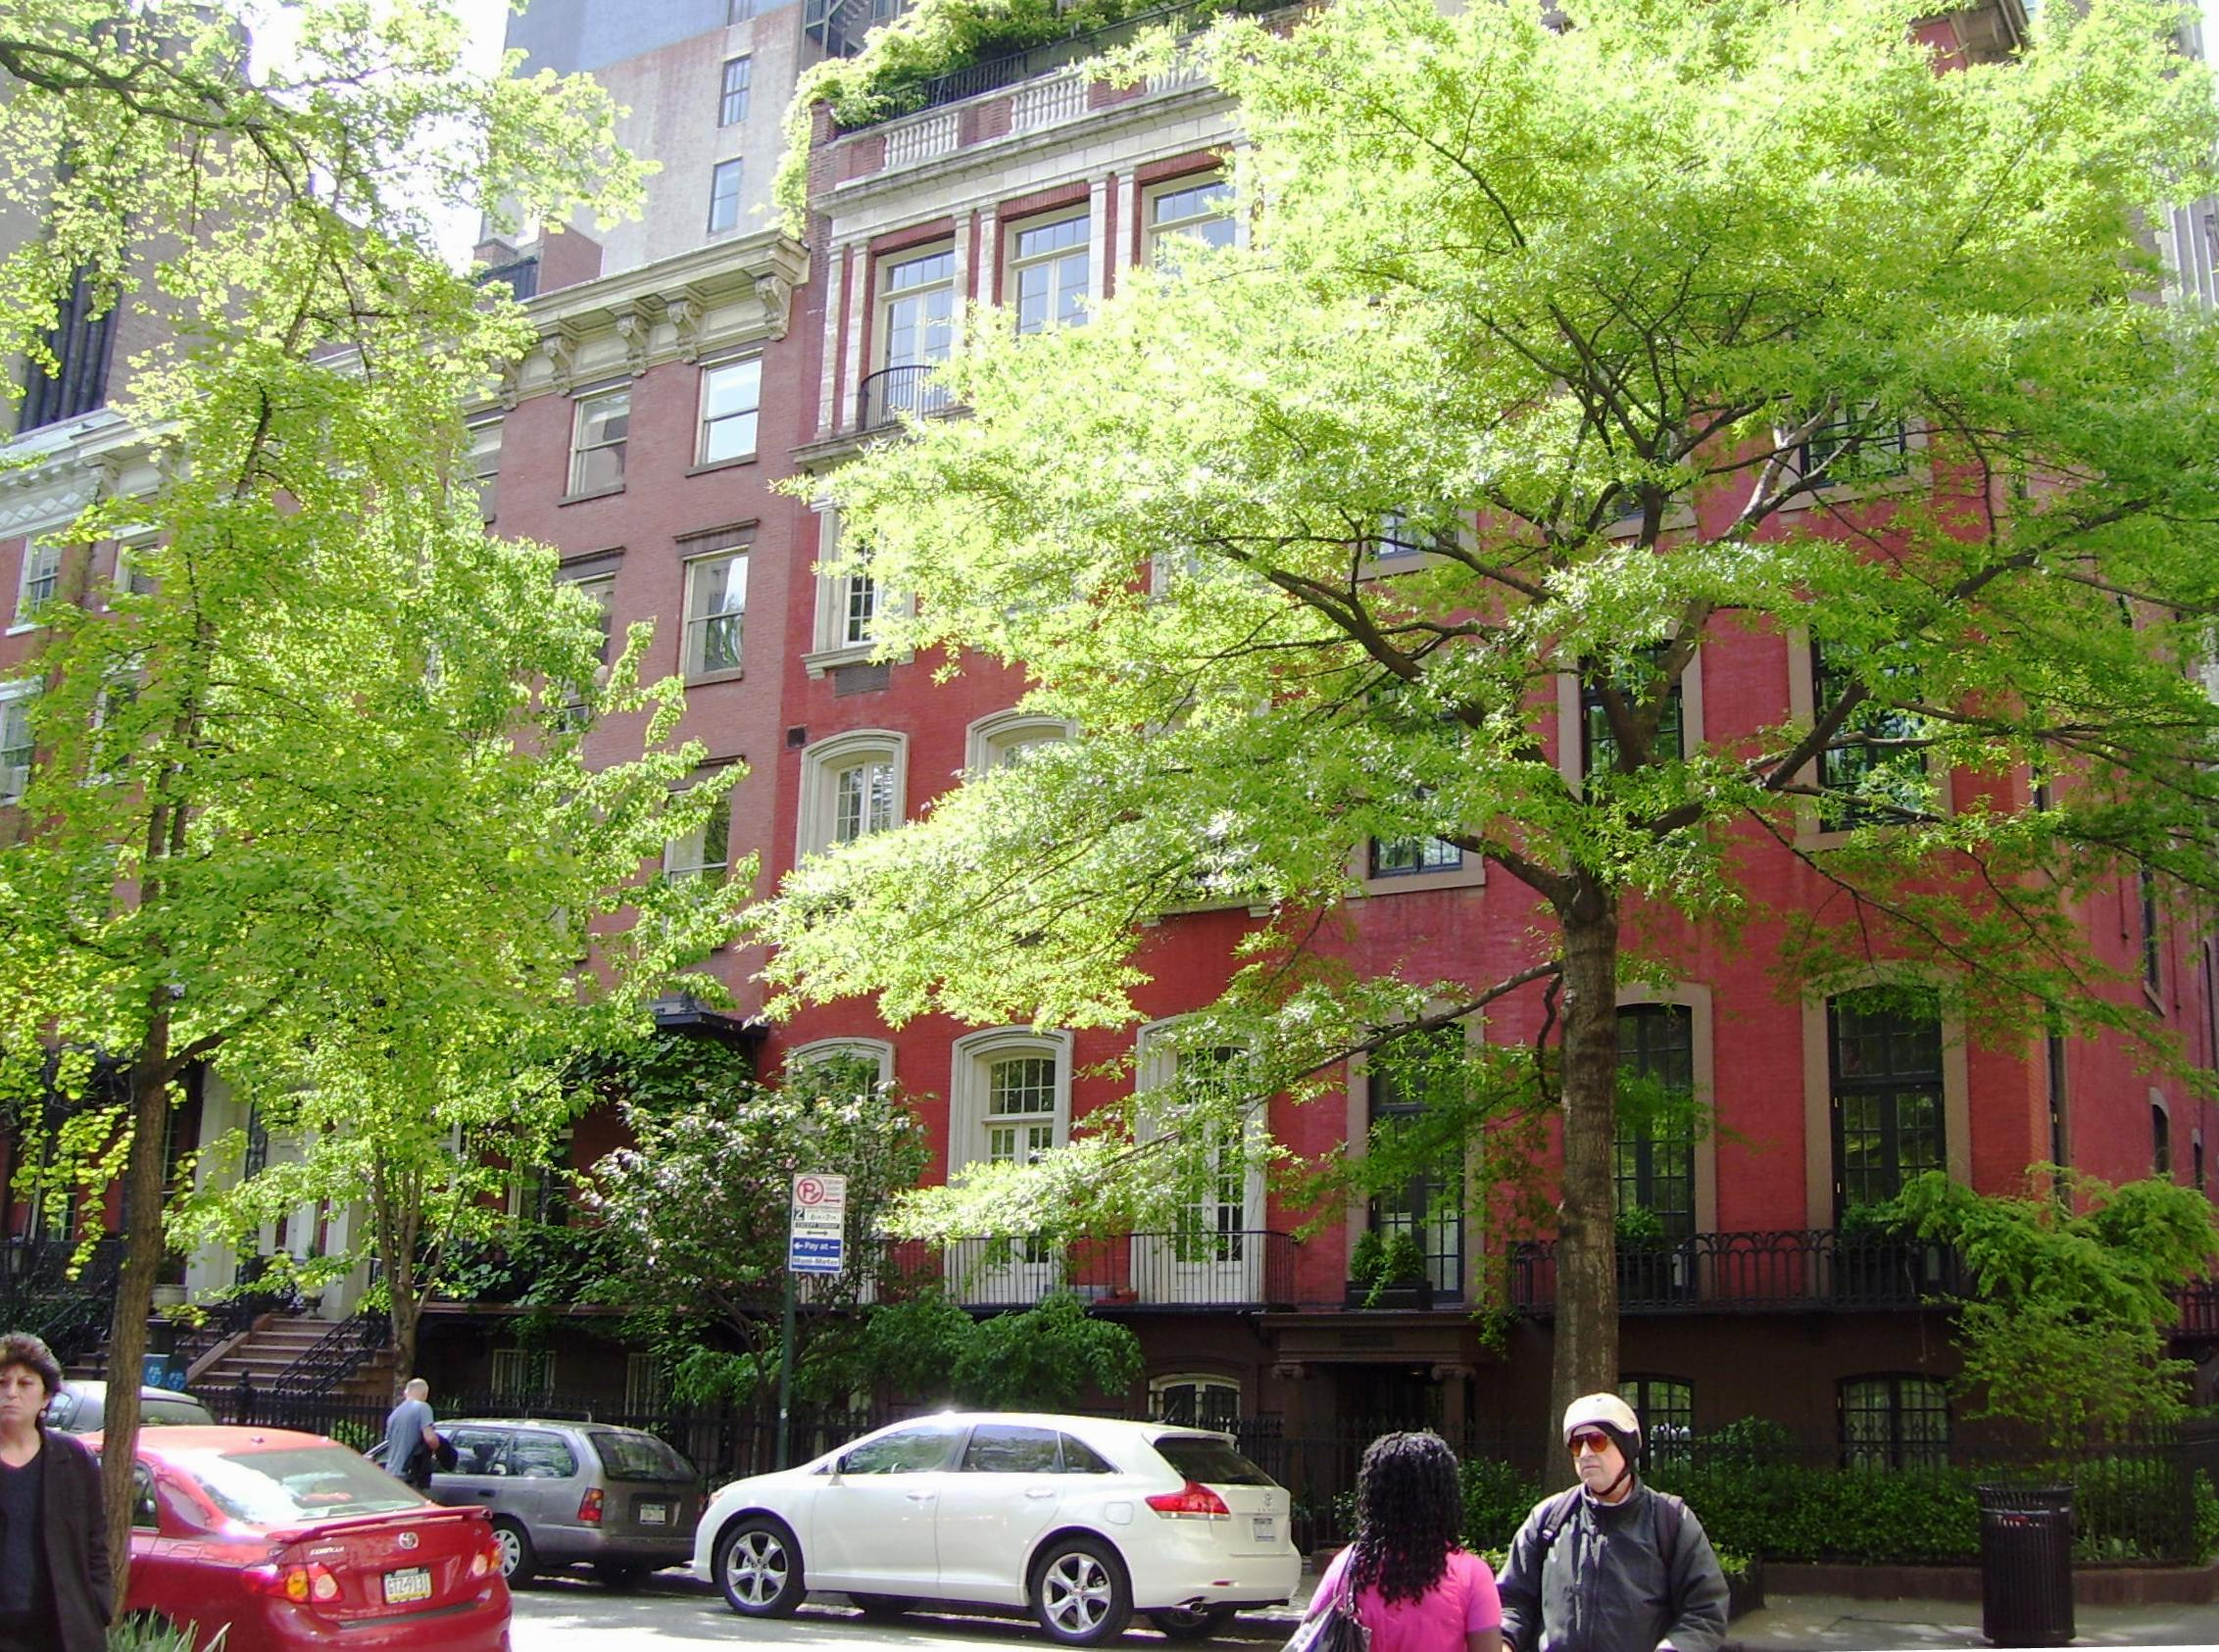 Gramercy park wiki everipedia for Gramercy park nyc apartments